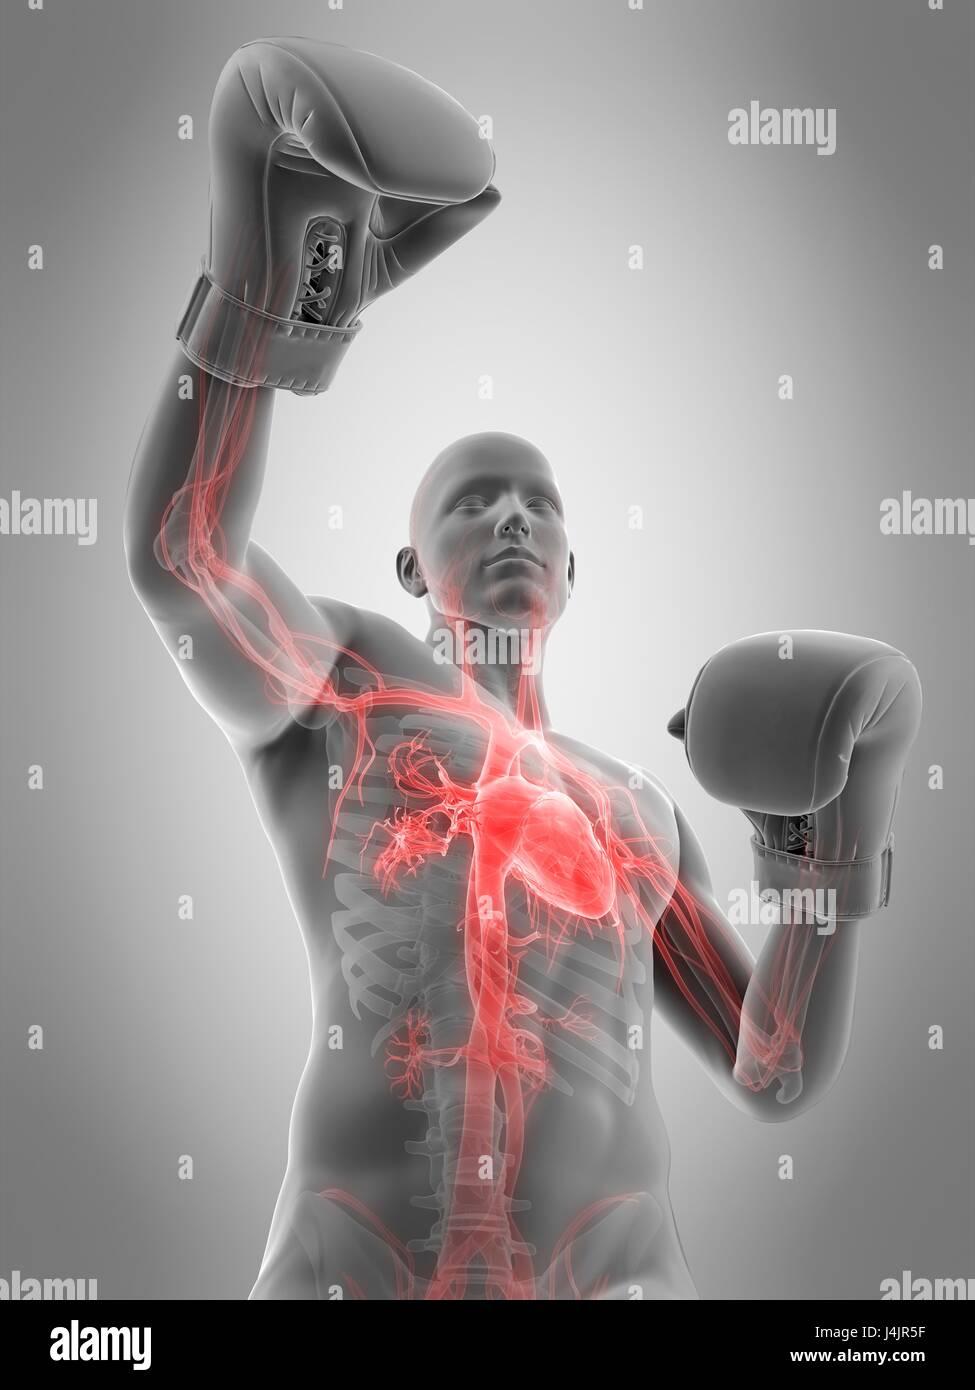 Anatomy Of A Boxer Imágenes De Stock & Anatomy Of A Boxer Fotos De ...